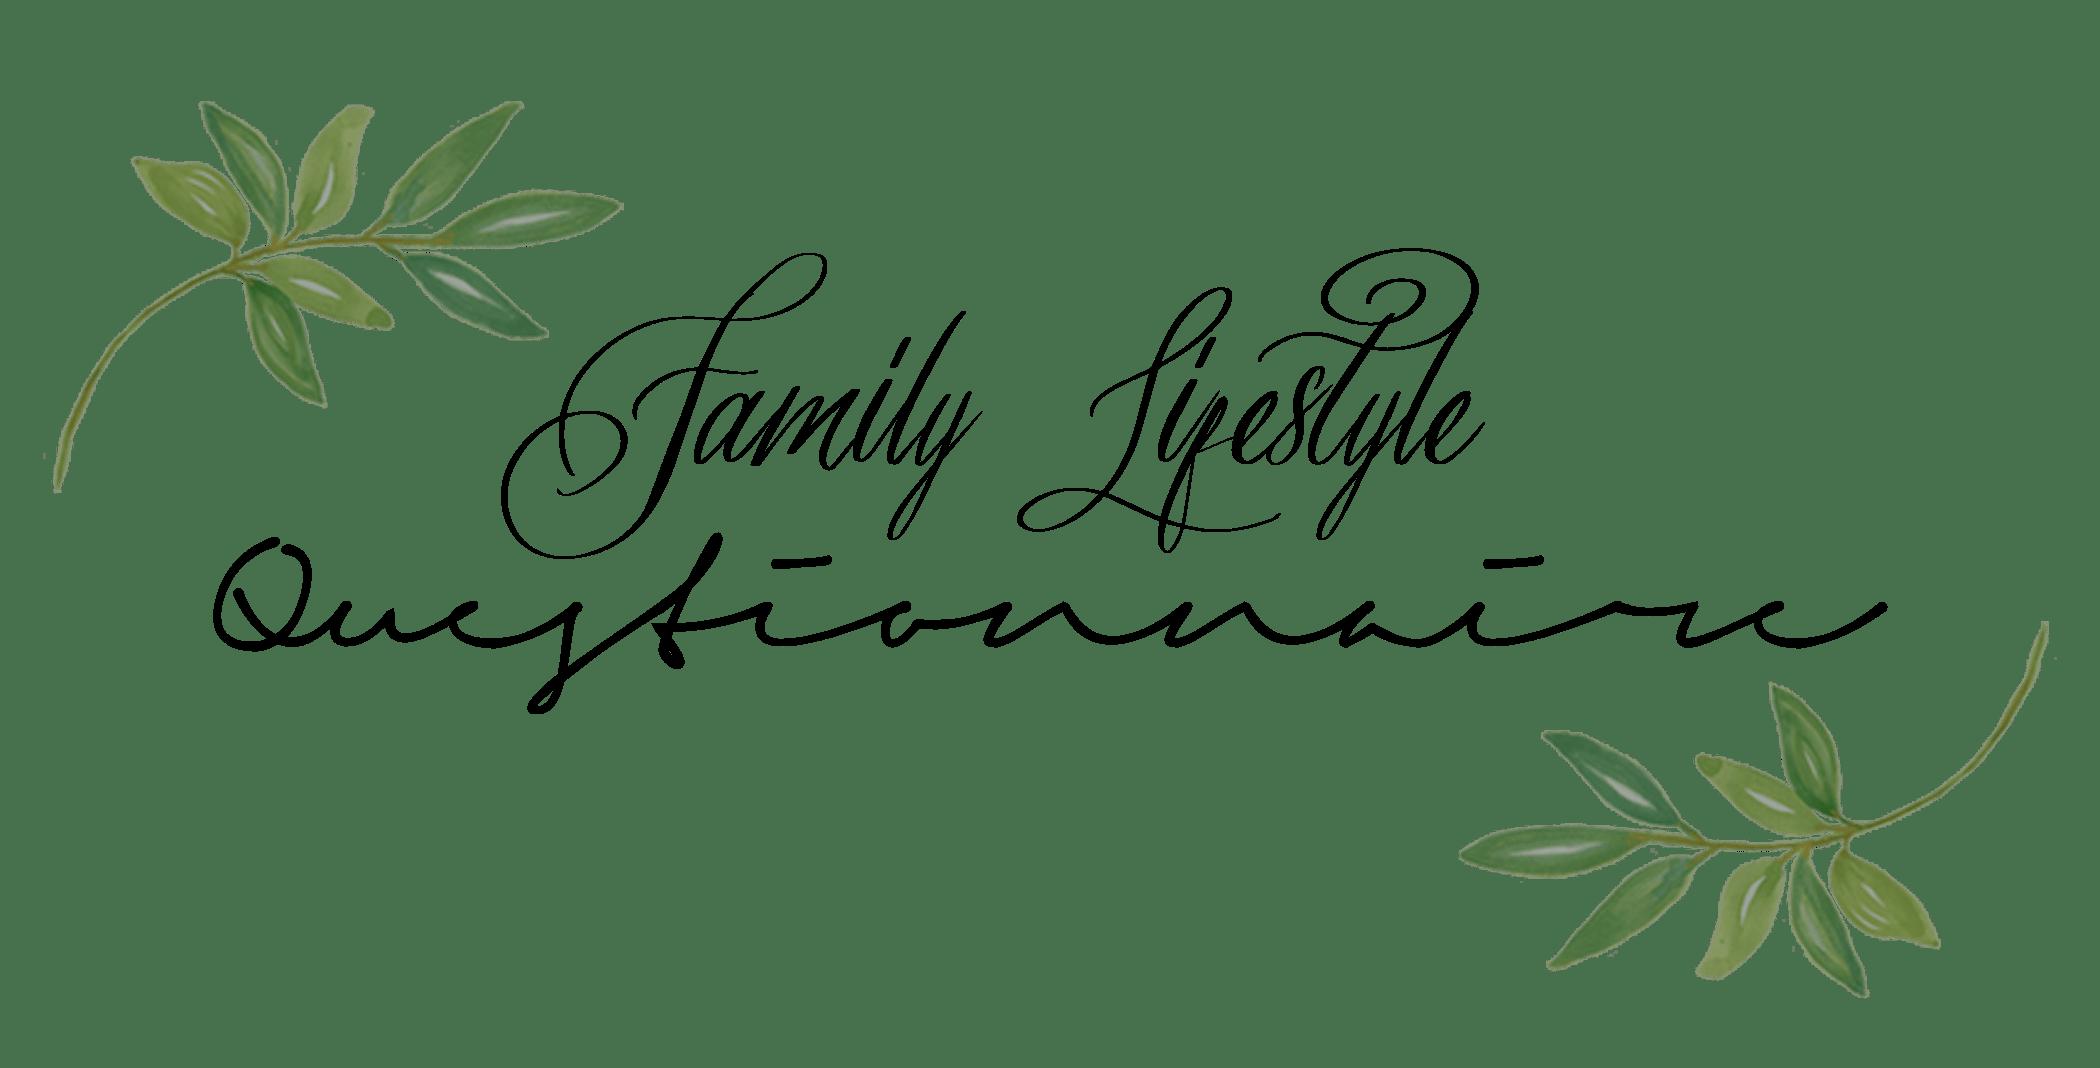 lifestylequestionnaire